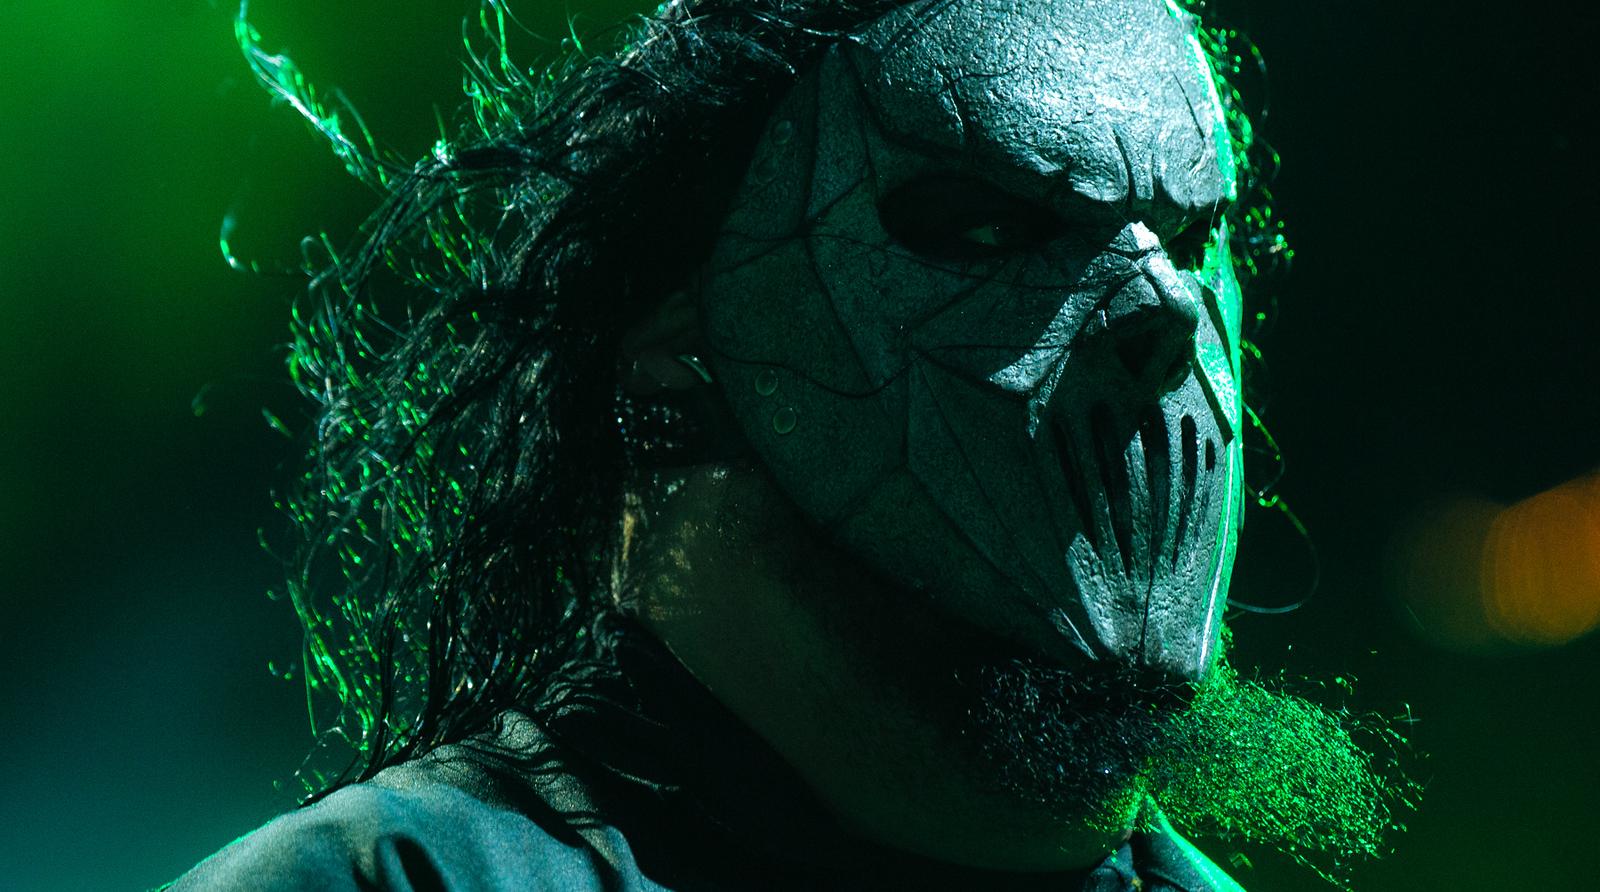 Mick Thomson of Slipknot by Adam Elmakias at Knotfest 2015